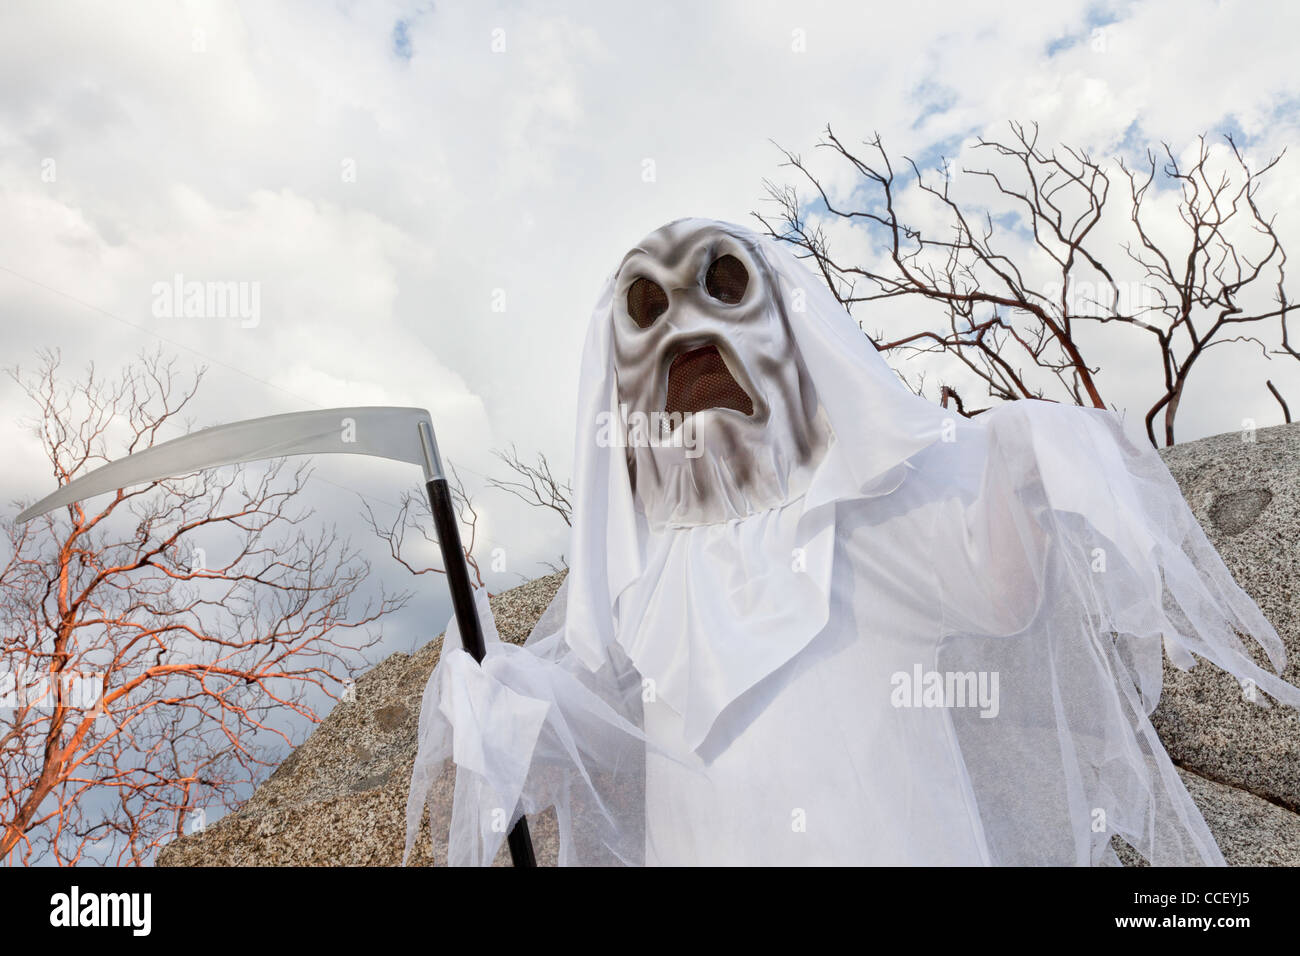 Boy dressed up as grim reaper holding scythe - Stock Image